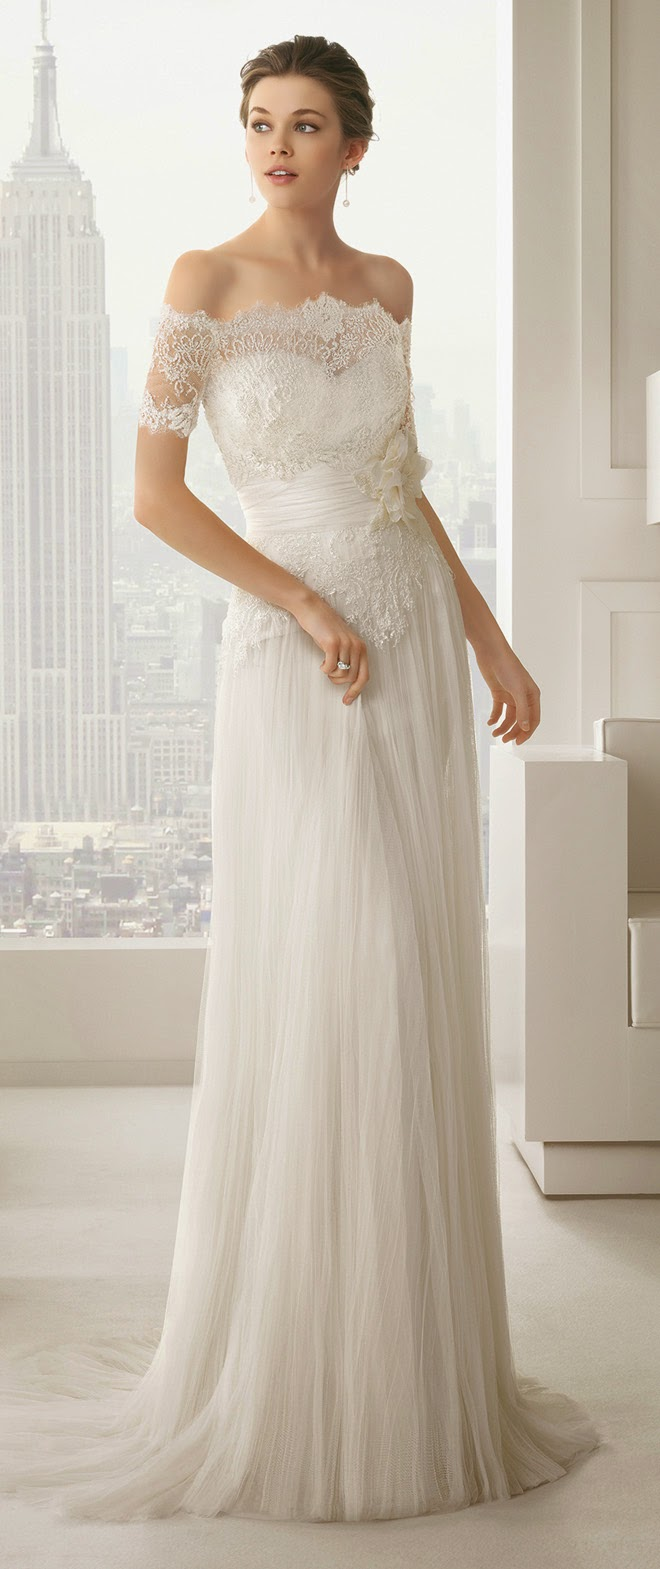 Rosa Clara 2015 Bridal Collection - Part 2 - Belle the Magazine ...